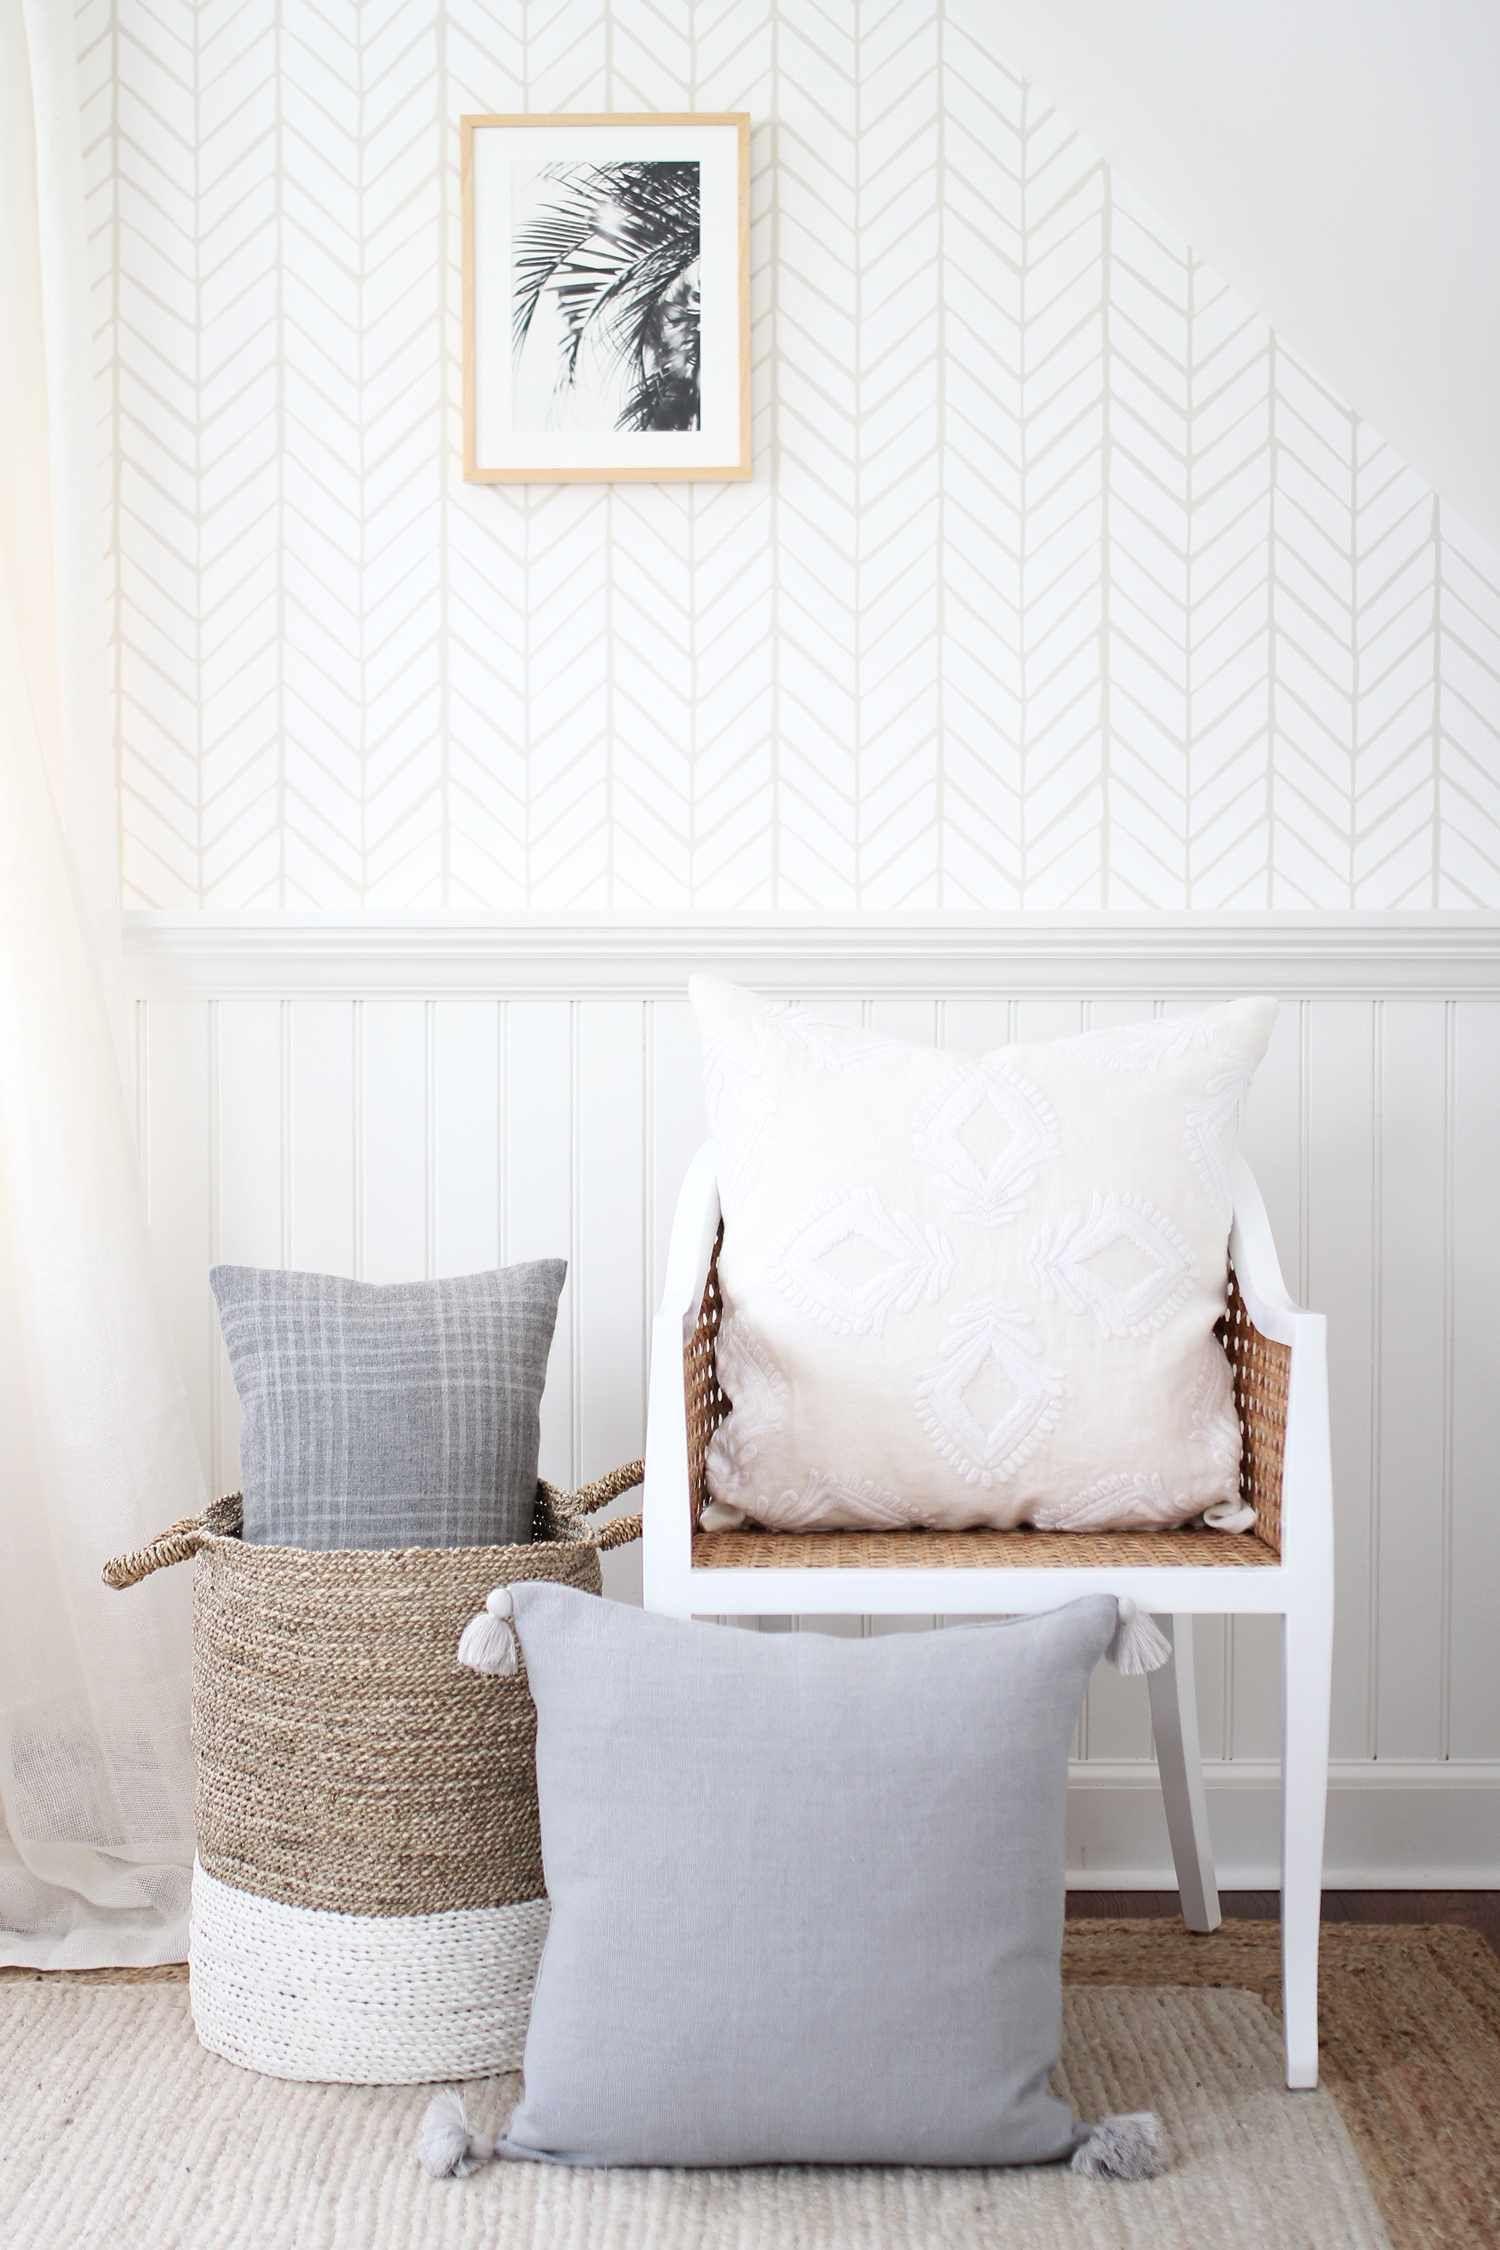 Feather Wallpaper Feather wallpaper, Home decor, Pillows